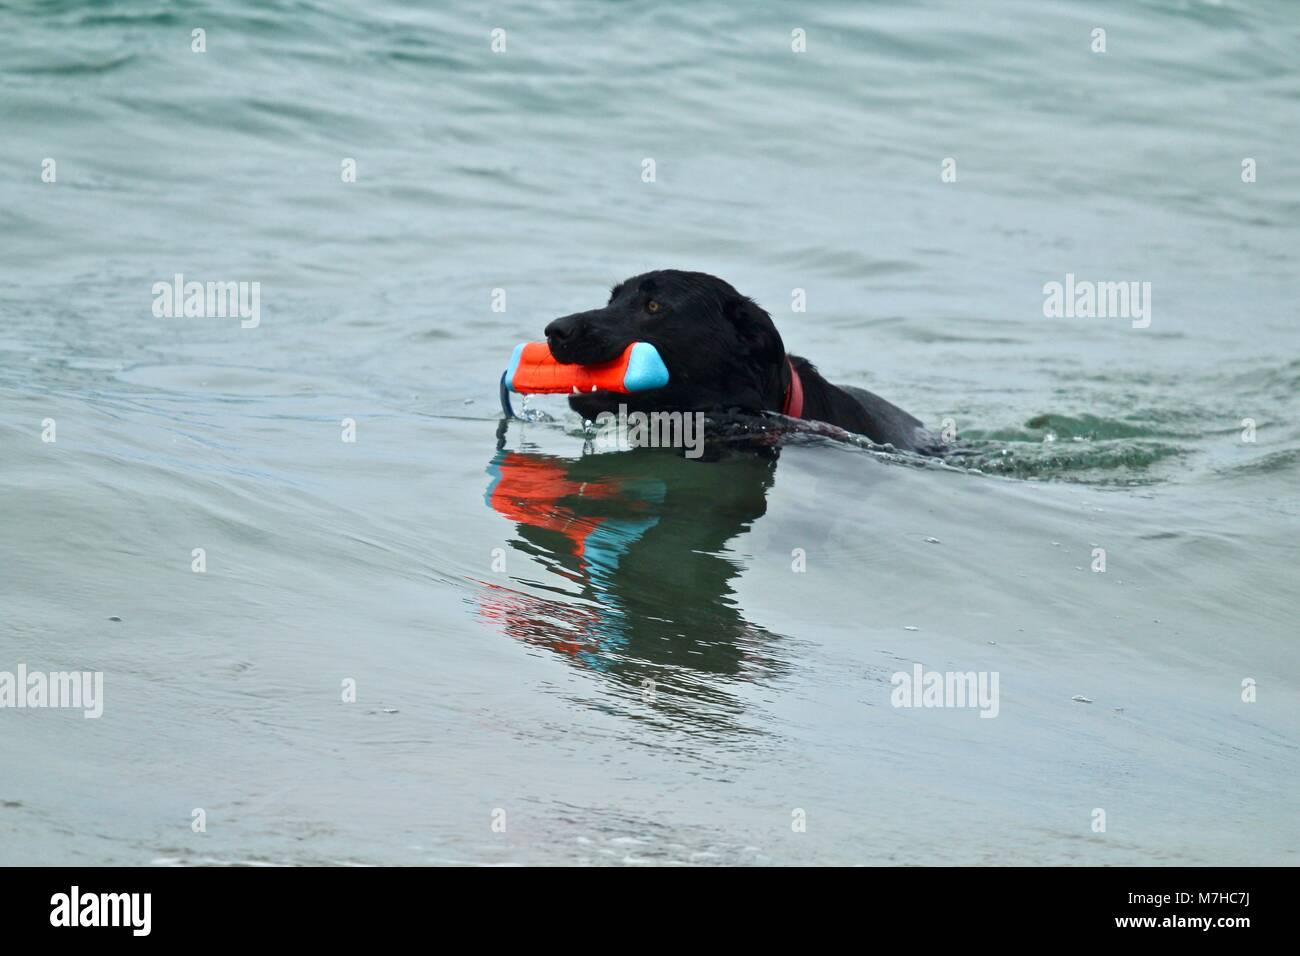 Black German Shepherd playing fetch in the ocean Stock Photo